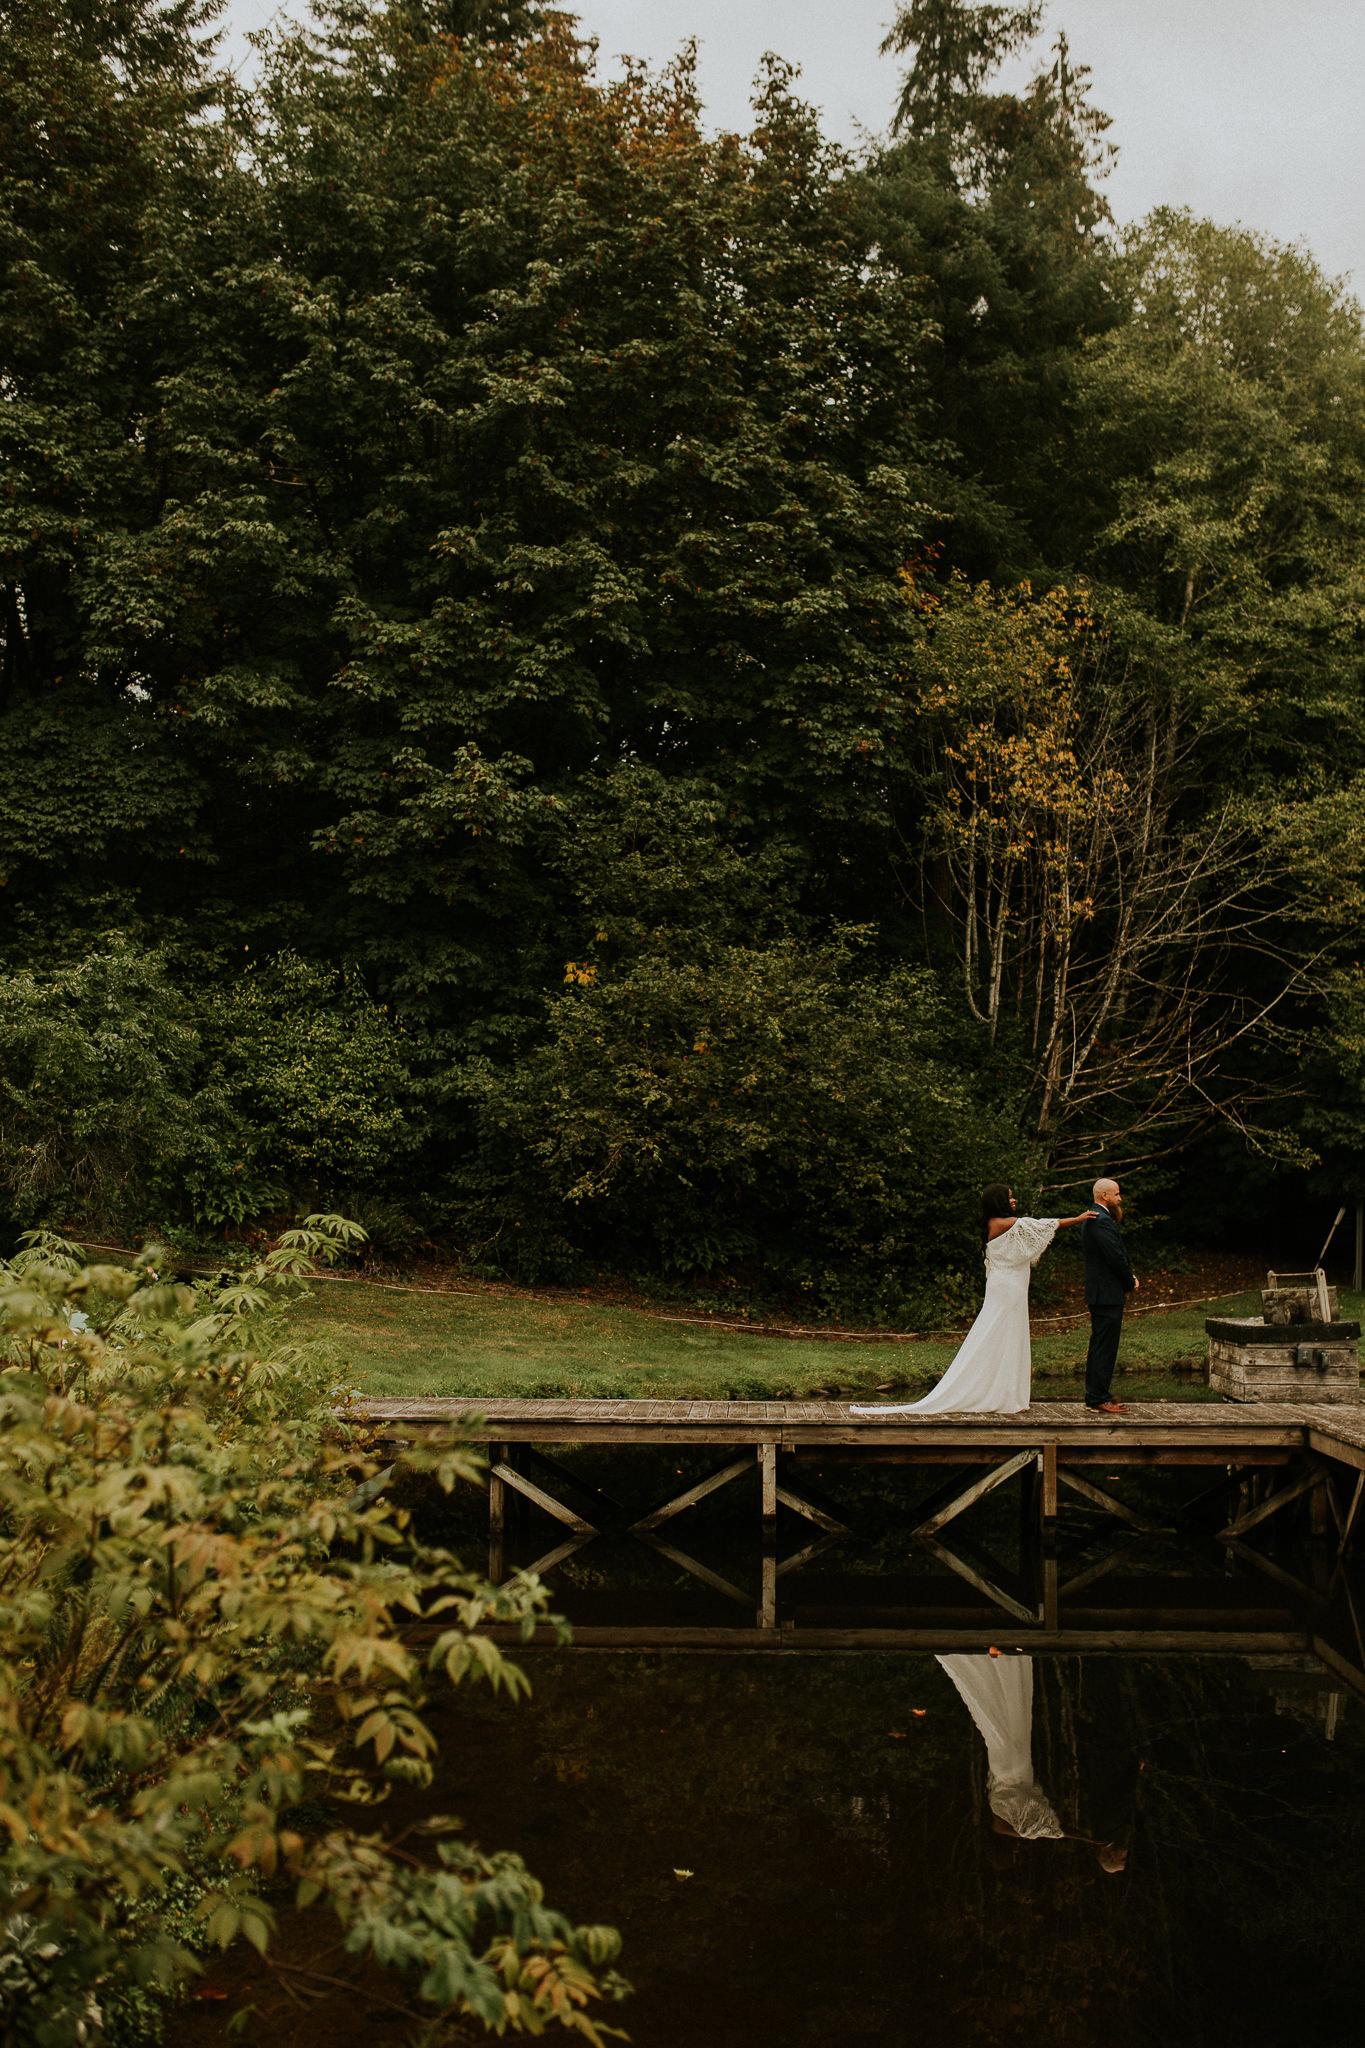 Lakeside-elopement-teasers-7.jpg